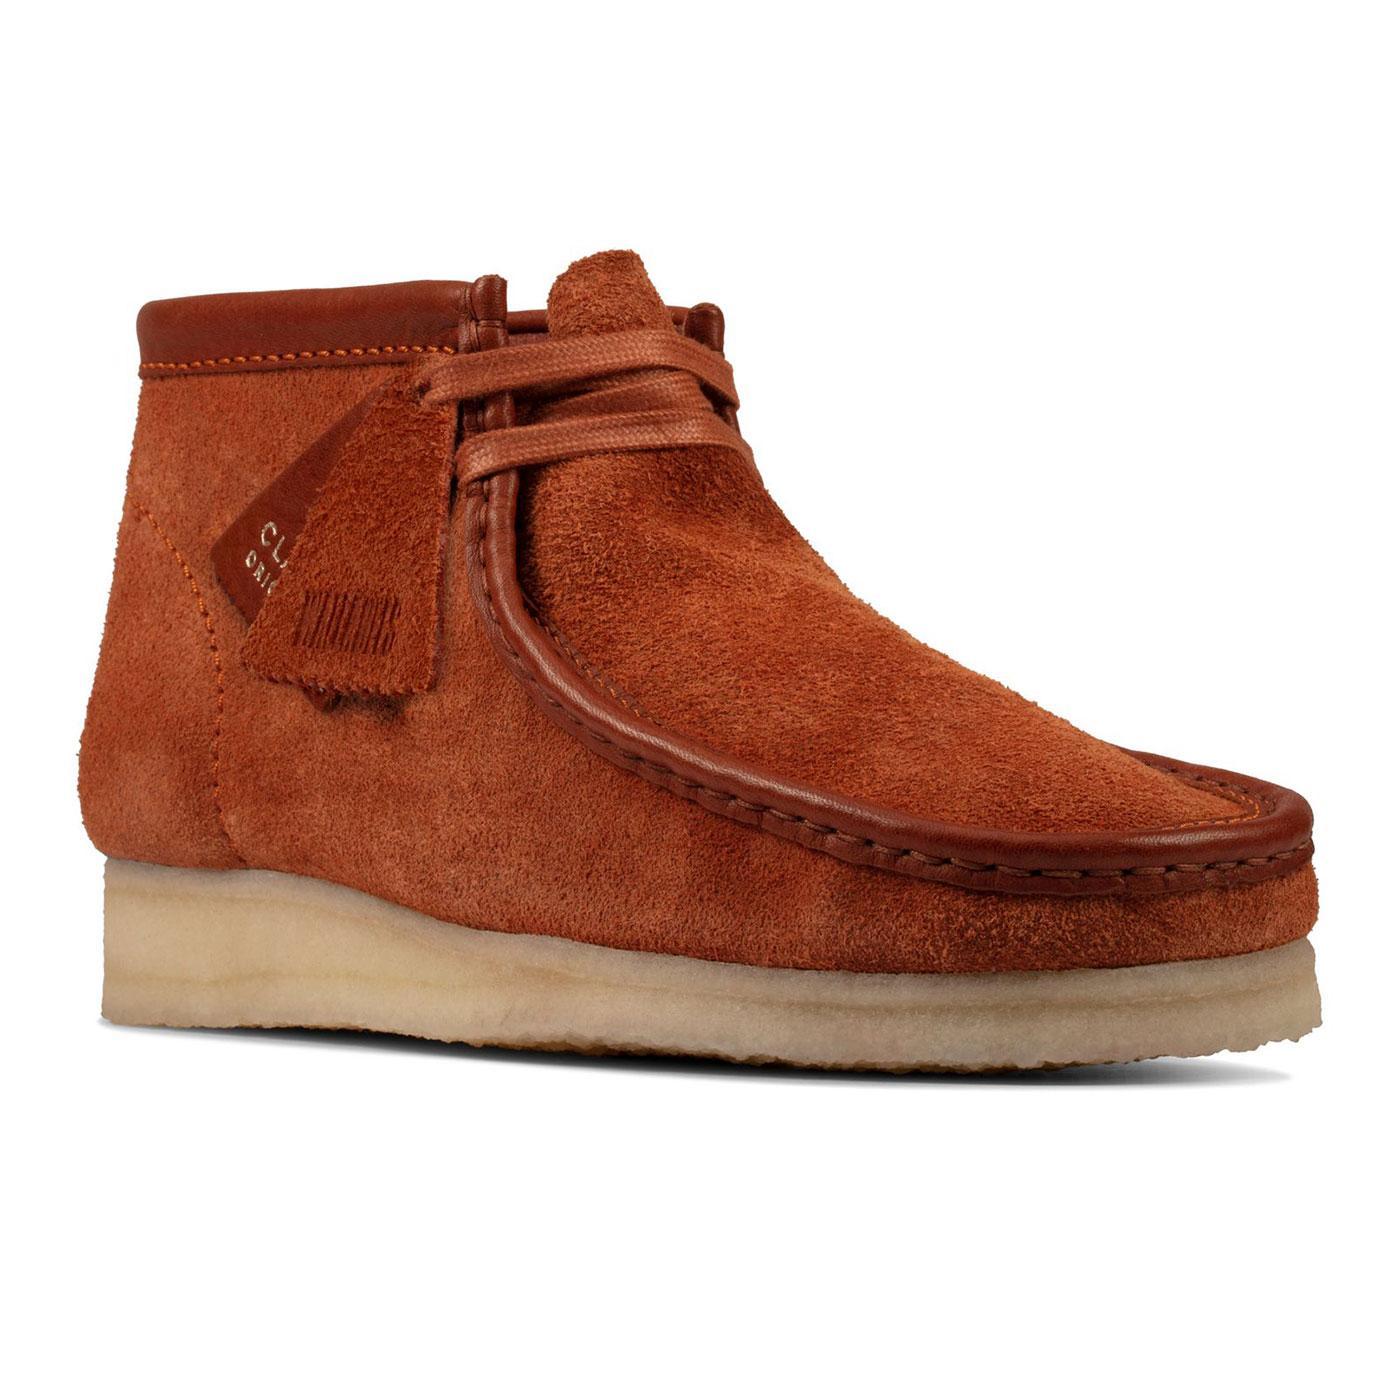 Wallabee Boots CLARKS ORIGINALS Suede Boots TAN